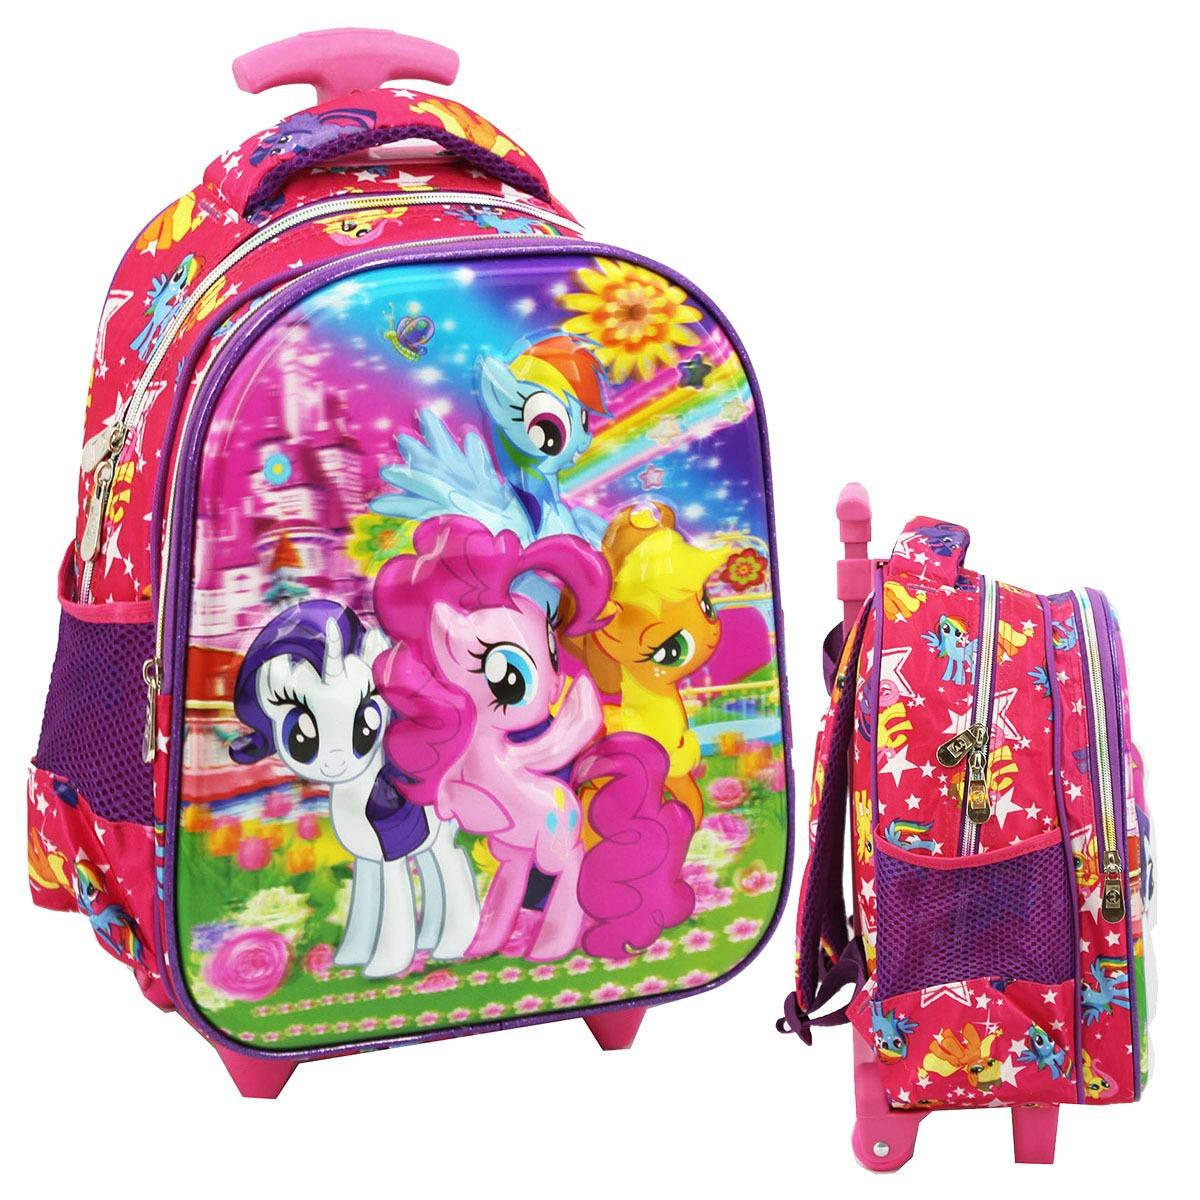 Toko Onlan My Little Pony 5D Timbul Hologram Tas Trolley Anak Sekolah Tk Import Murah Dki Jakarta